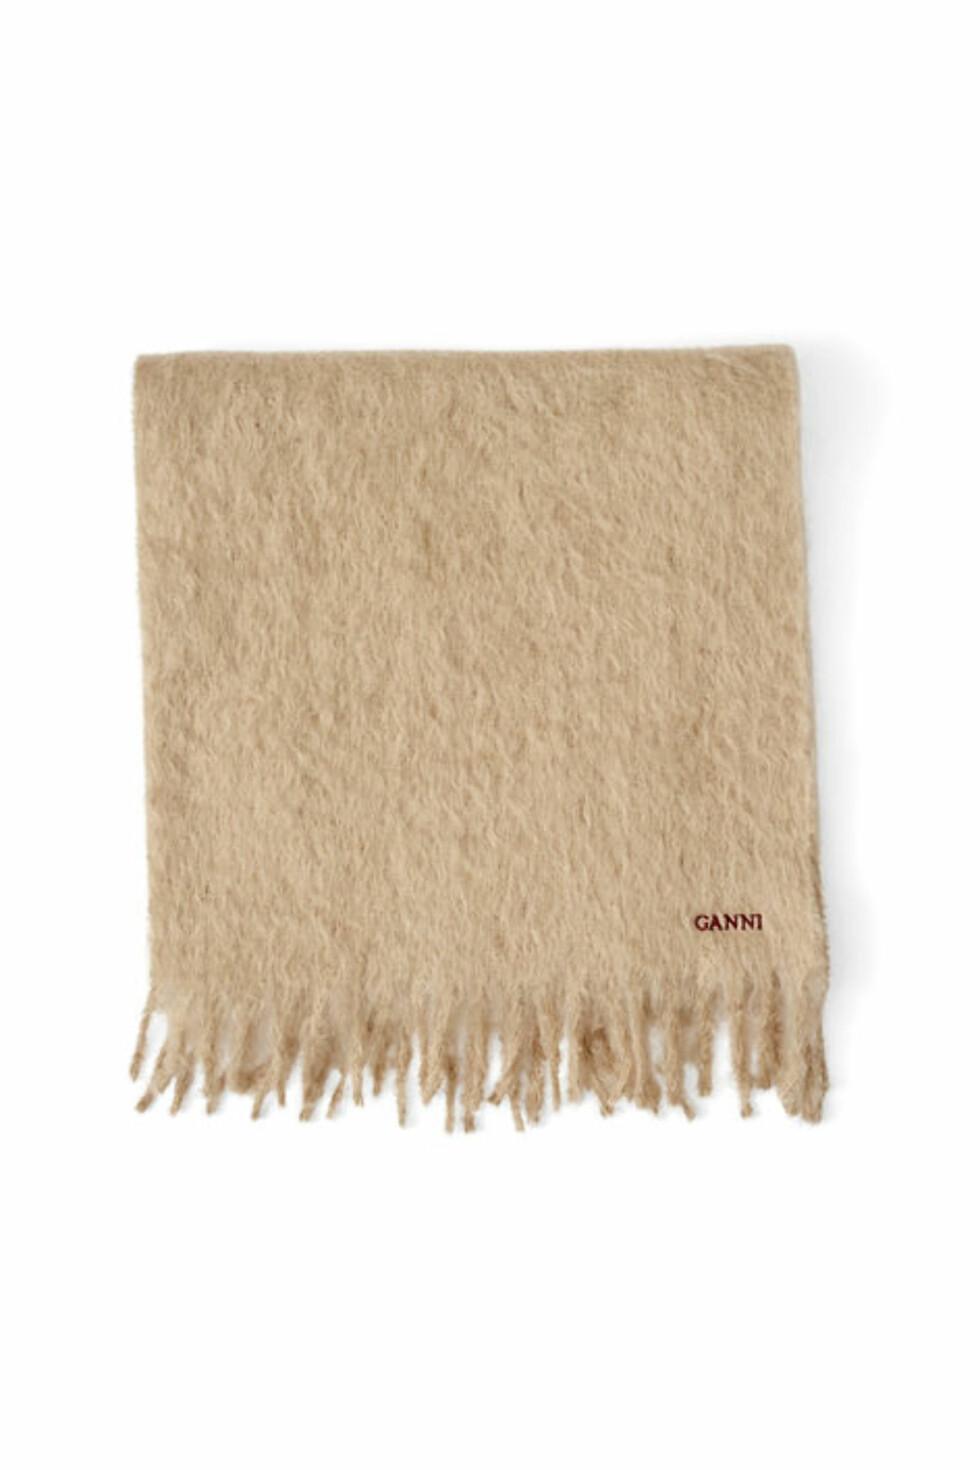 Skjerf fra Ganni | kr 959 | http://www.ganni.com/shop/accessories/farley-mohair-scarf/A0961.html?dwvar_A0961_color=Tobacco%20Brown